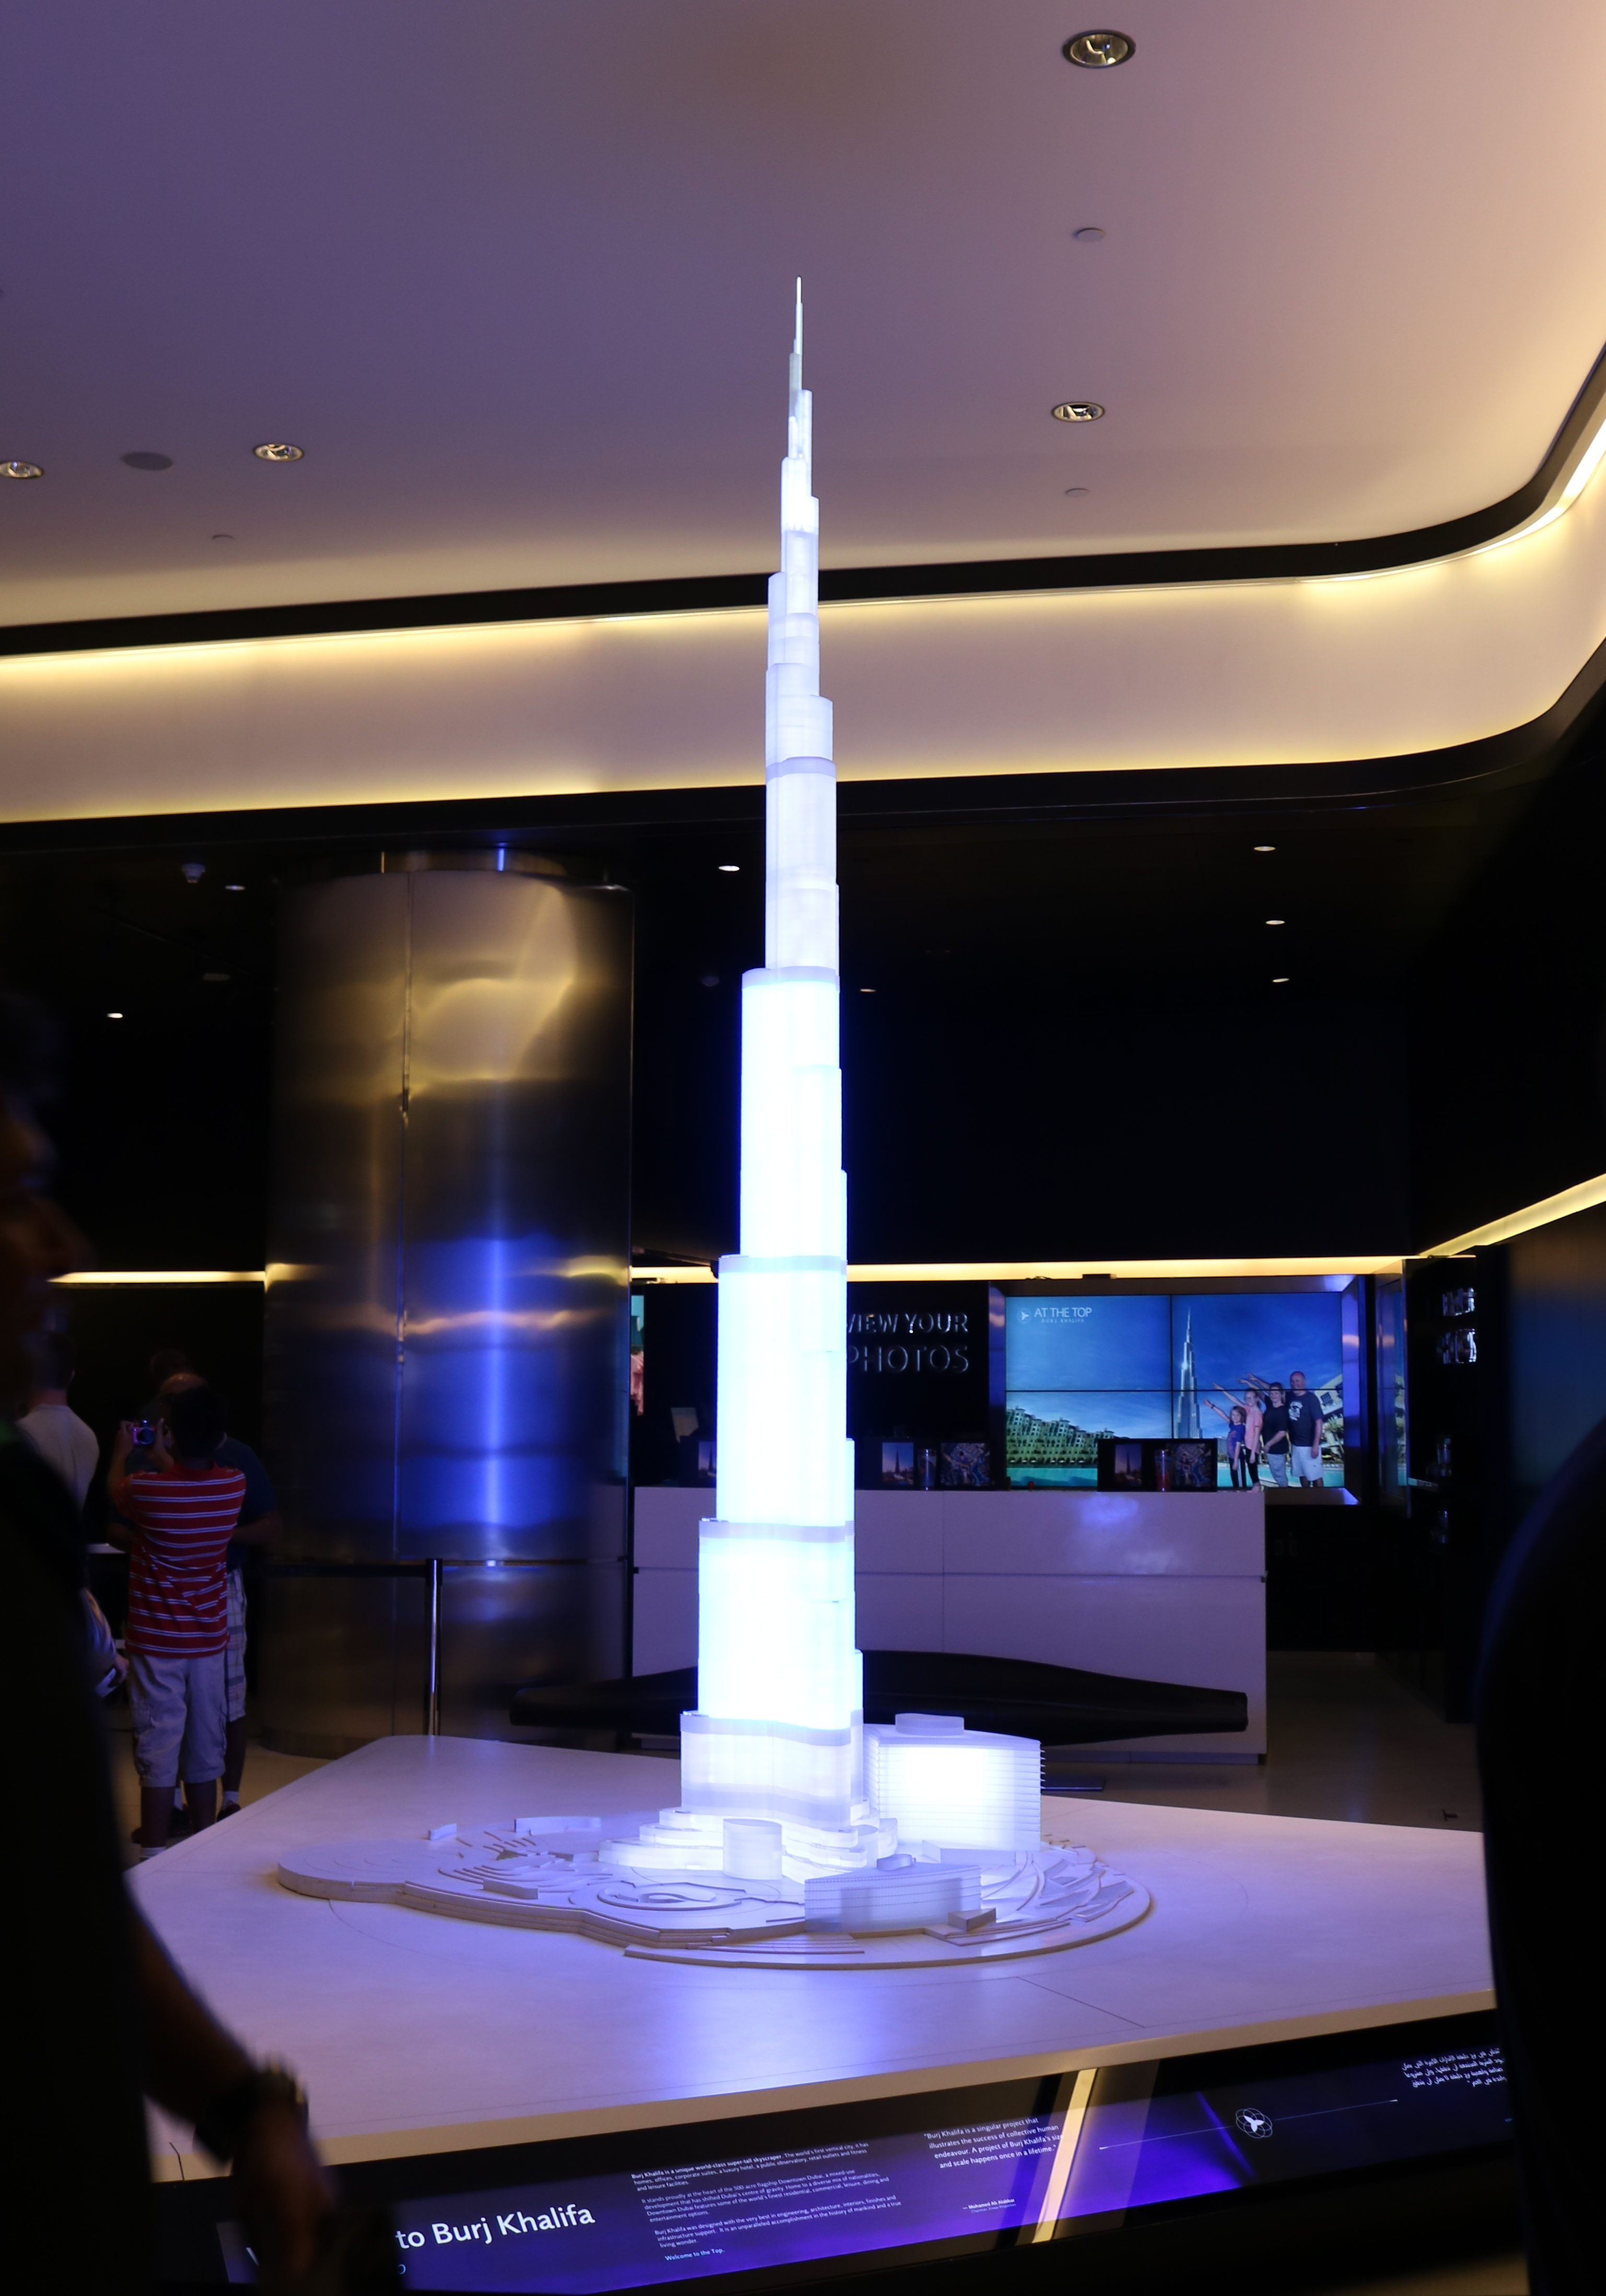 2017UAEドバイ バージュ・カリファ 展望台へ 模型